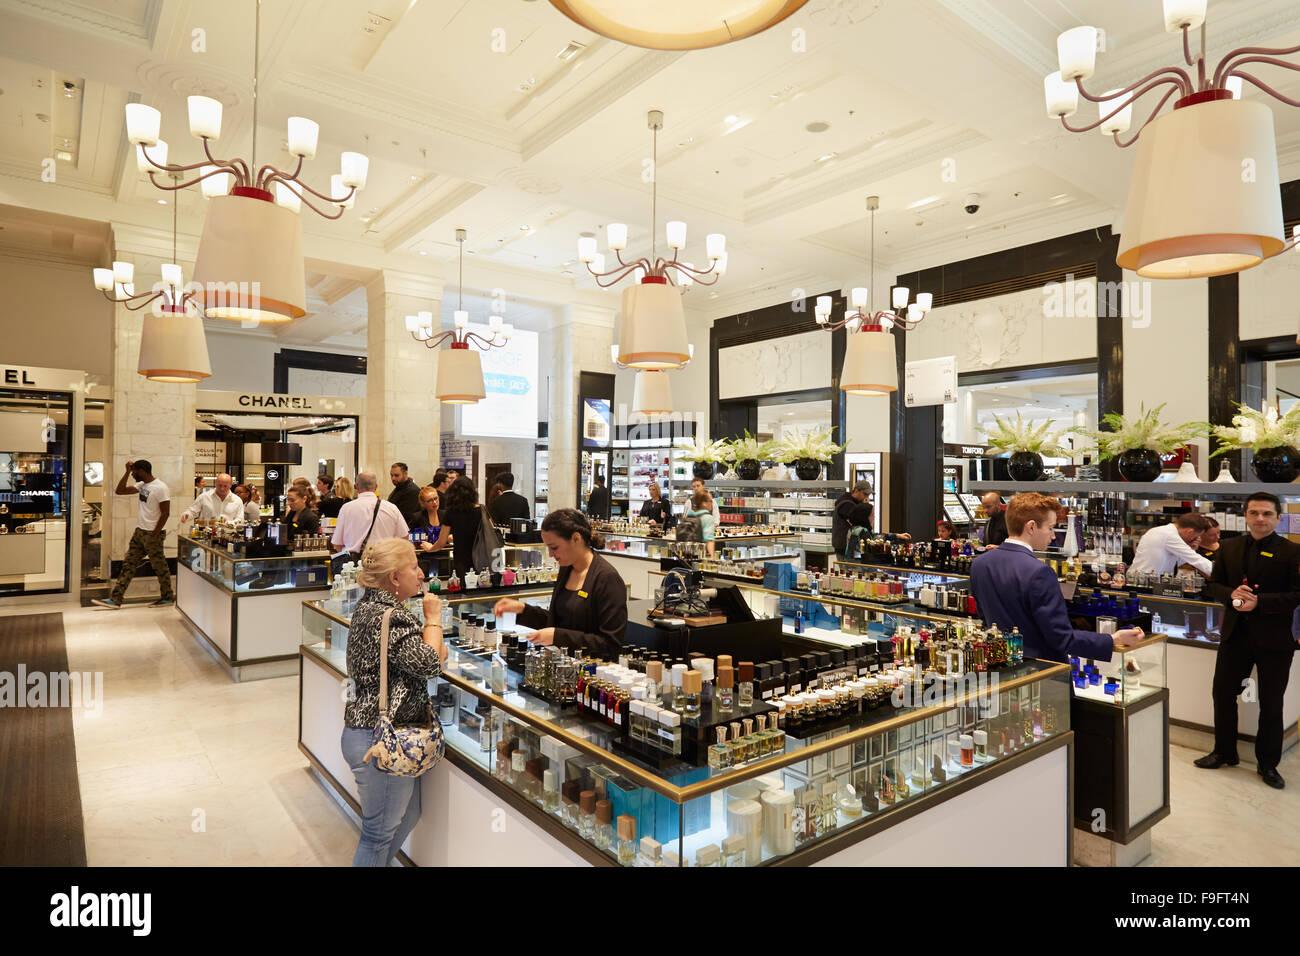 Selfridges department store interior, perfumery area in London - Stock Image